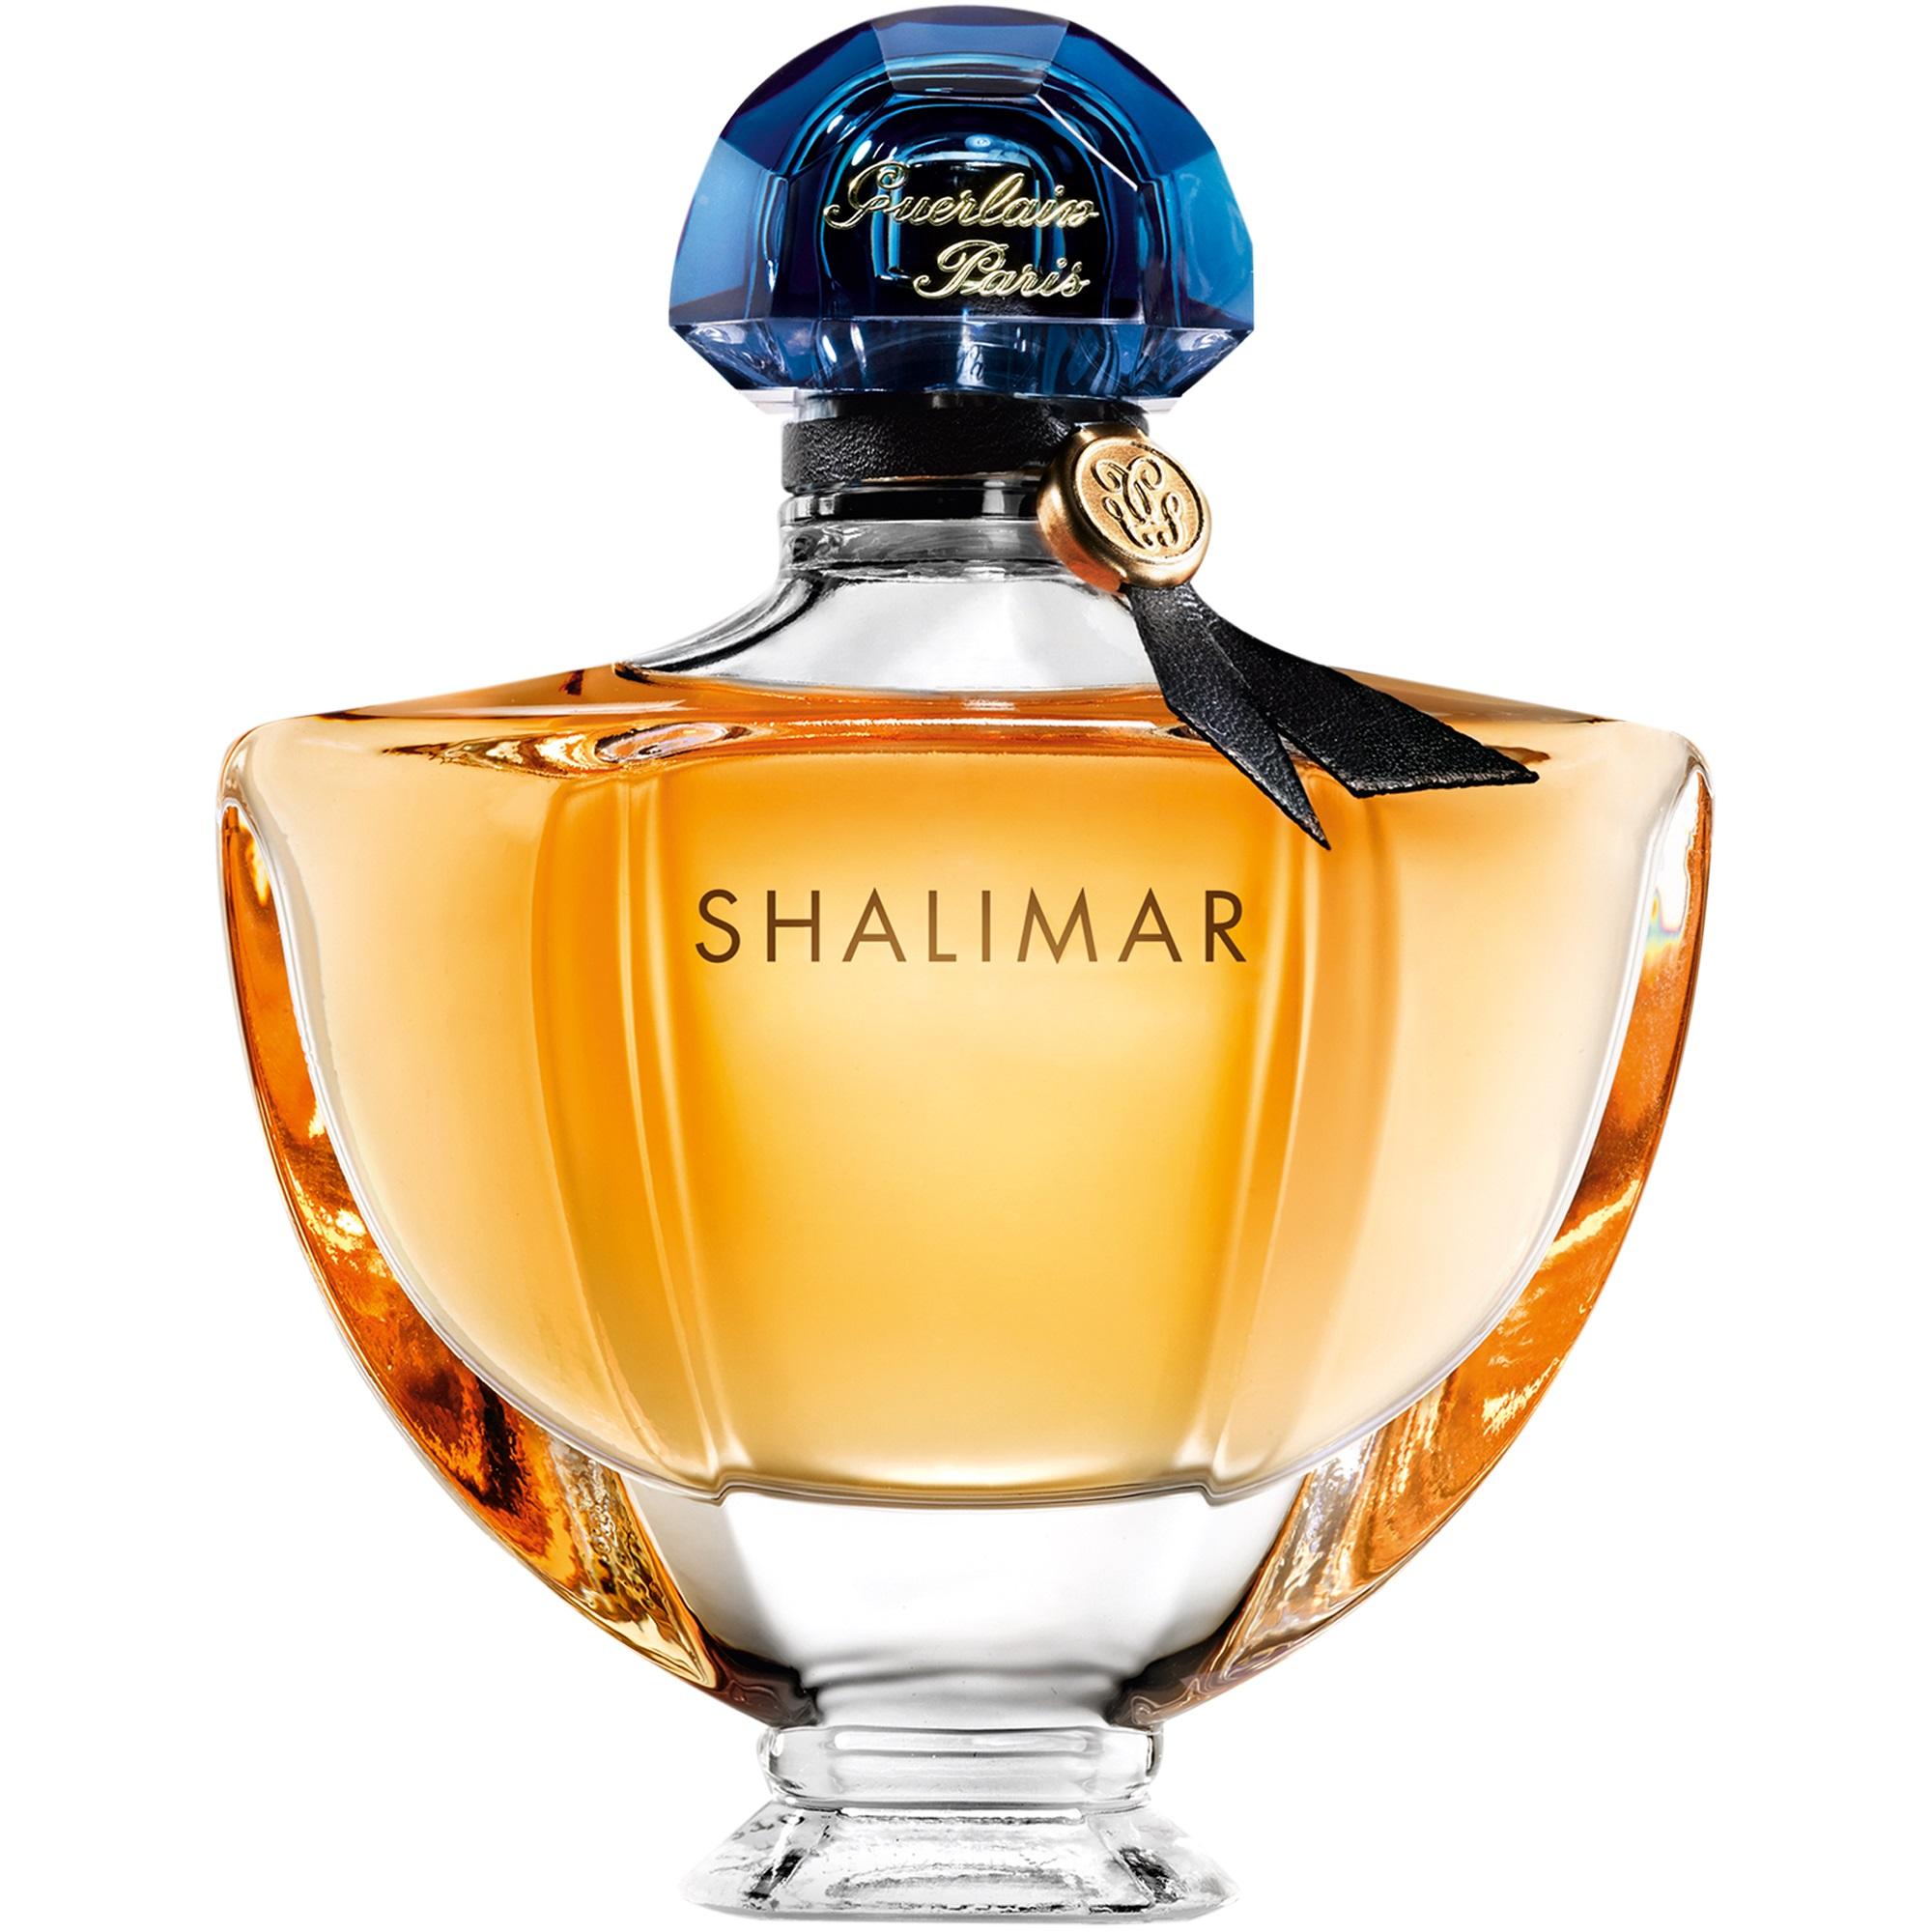 ادو تویلت زنانه گرلن مدل Shalimar حجم 90 میلی لیتر